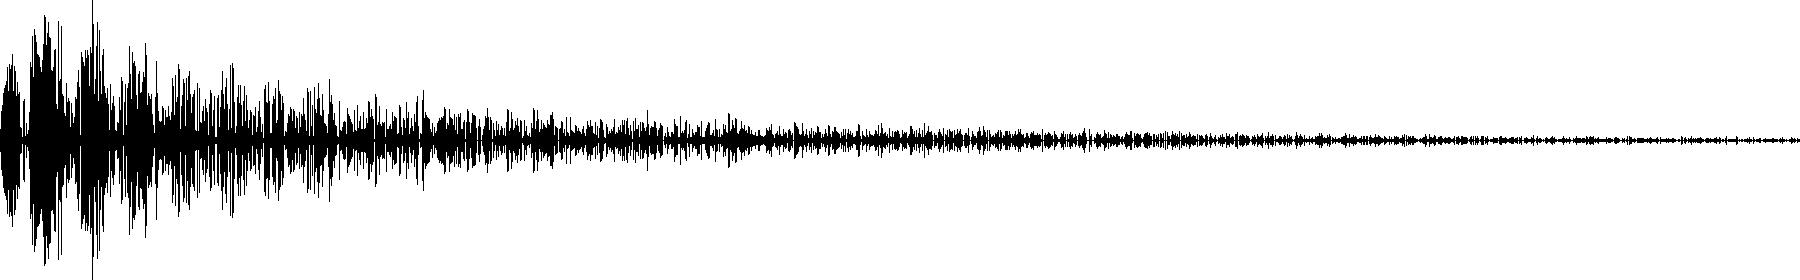 110snr